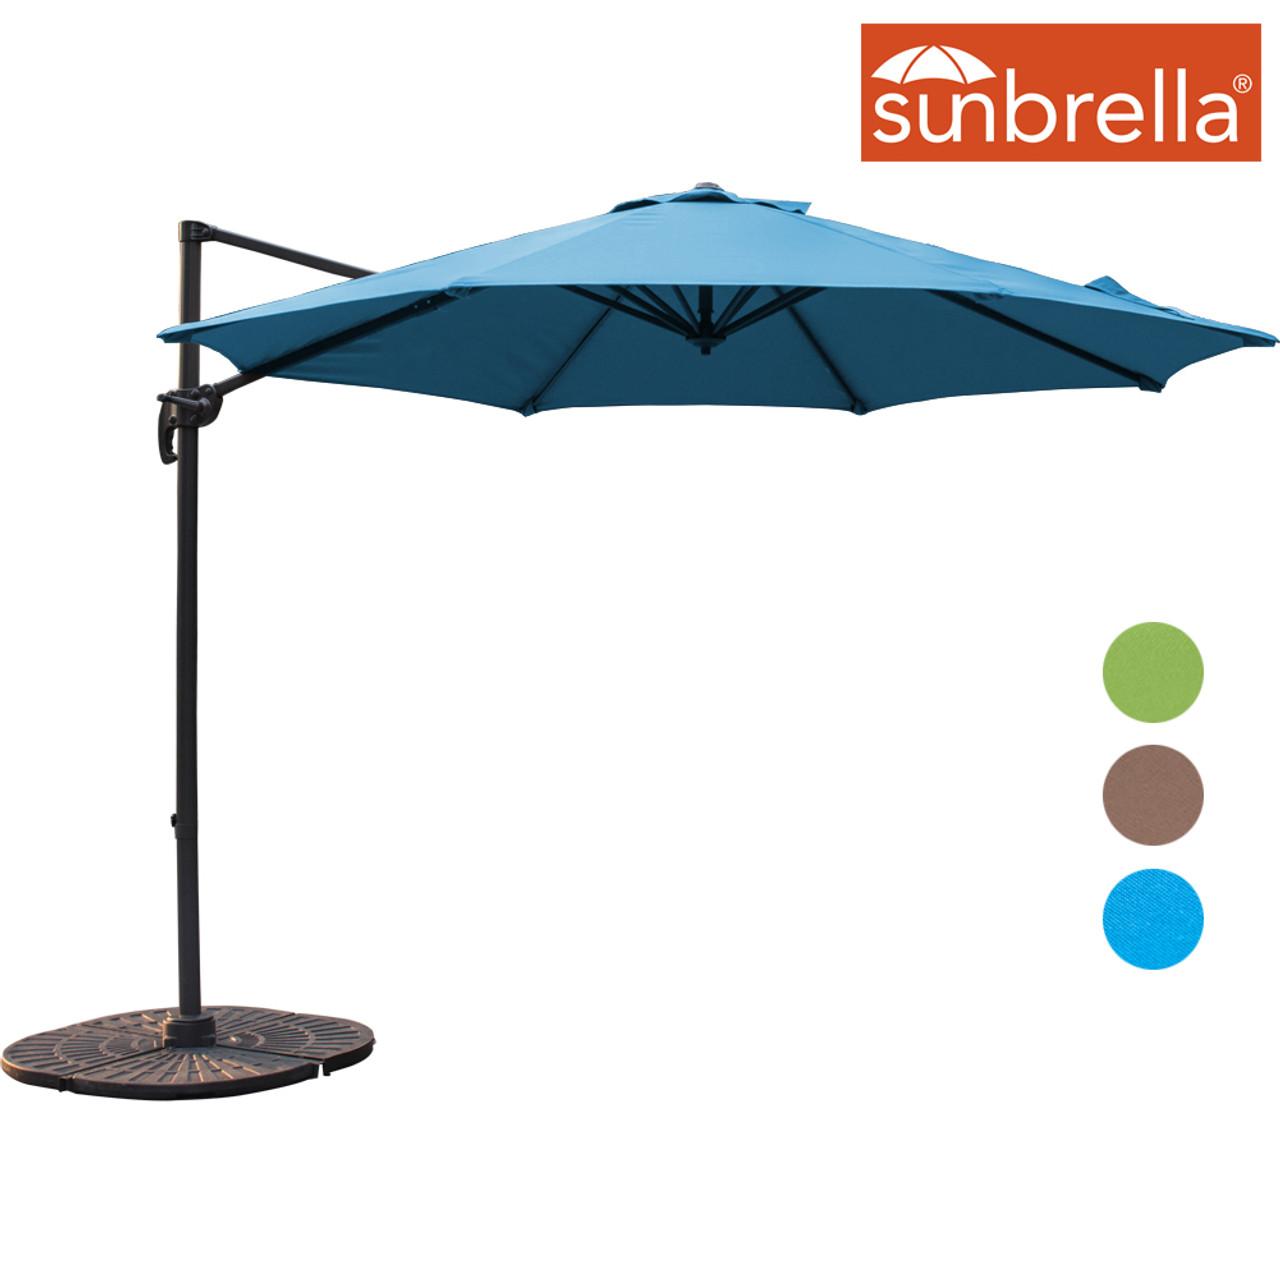 Sundale Outdoor 10ft Sunbrella® Fabric Offset Hanging Umbrella Market Patio  Umbrella Aluminum Cantilever Pole With